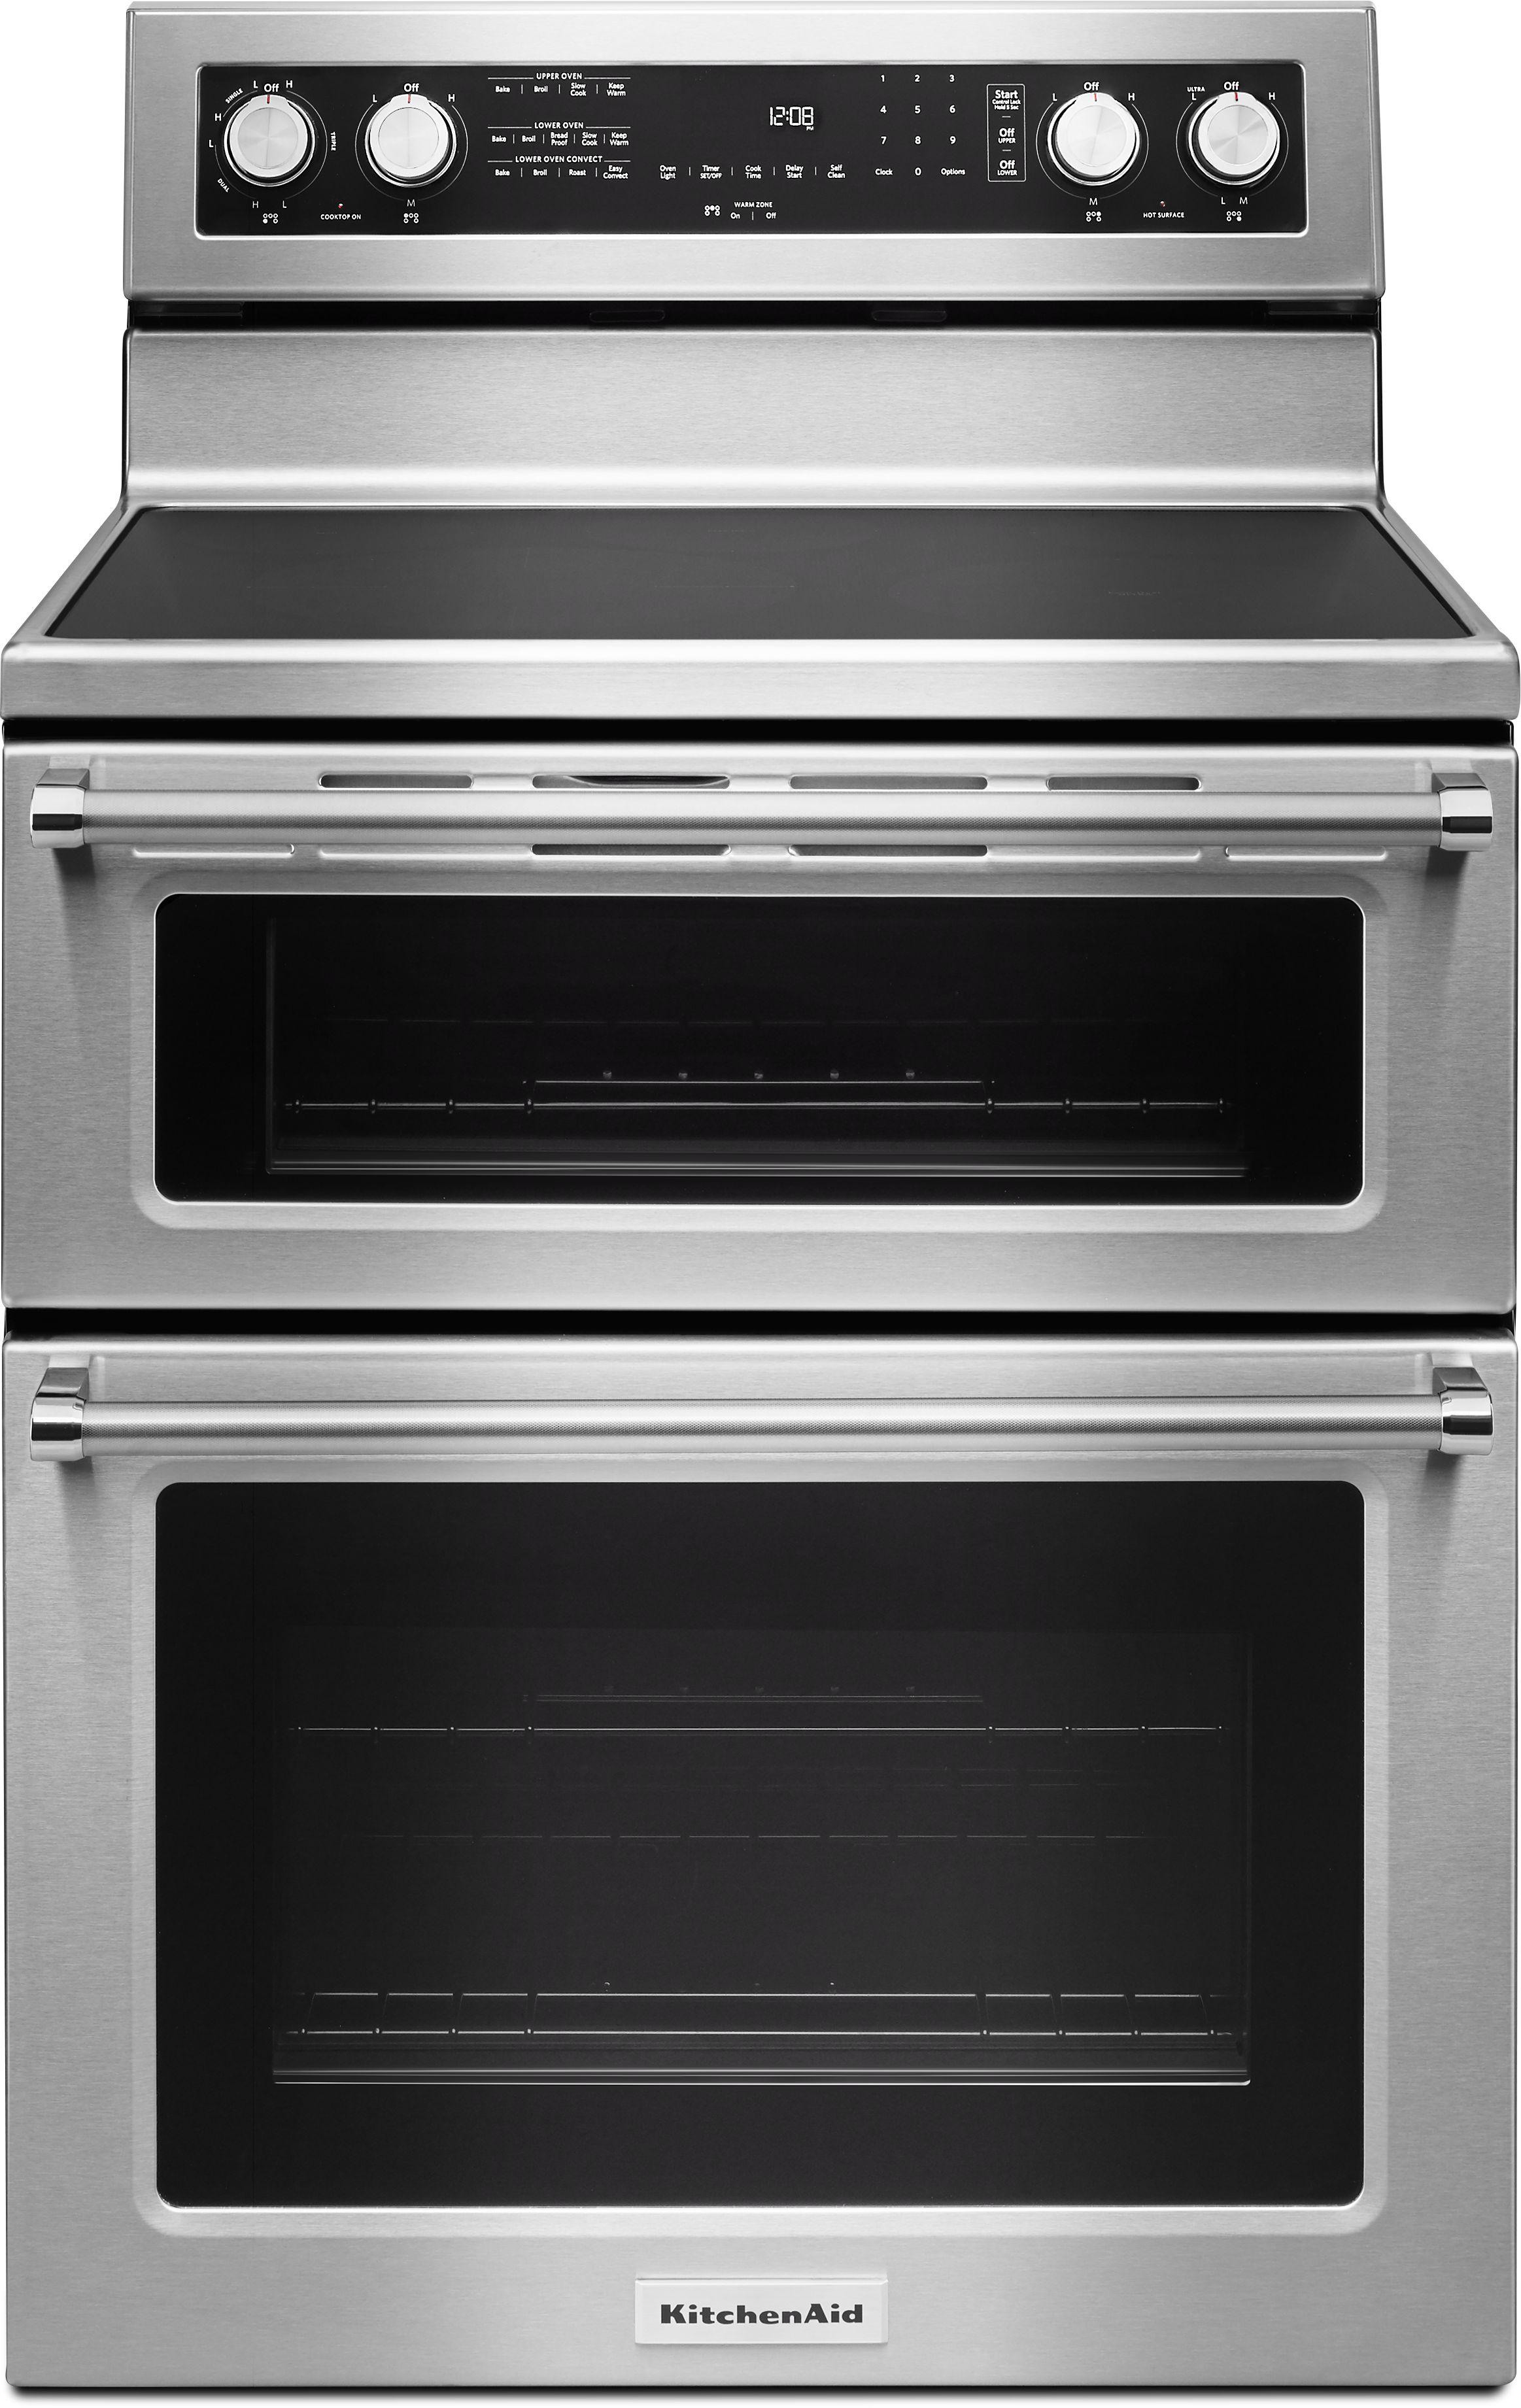 Kitchenaid 30 Free Standing Electric Double Oven Range Kfed500e